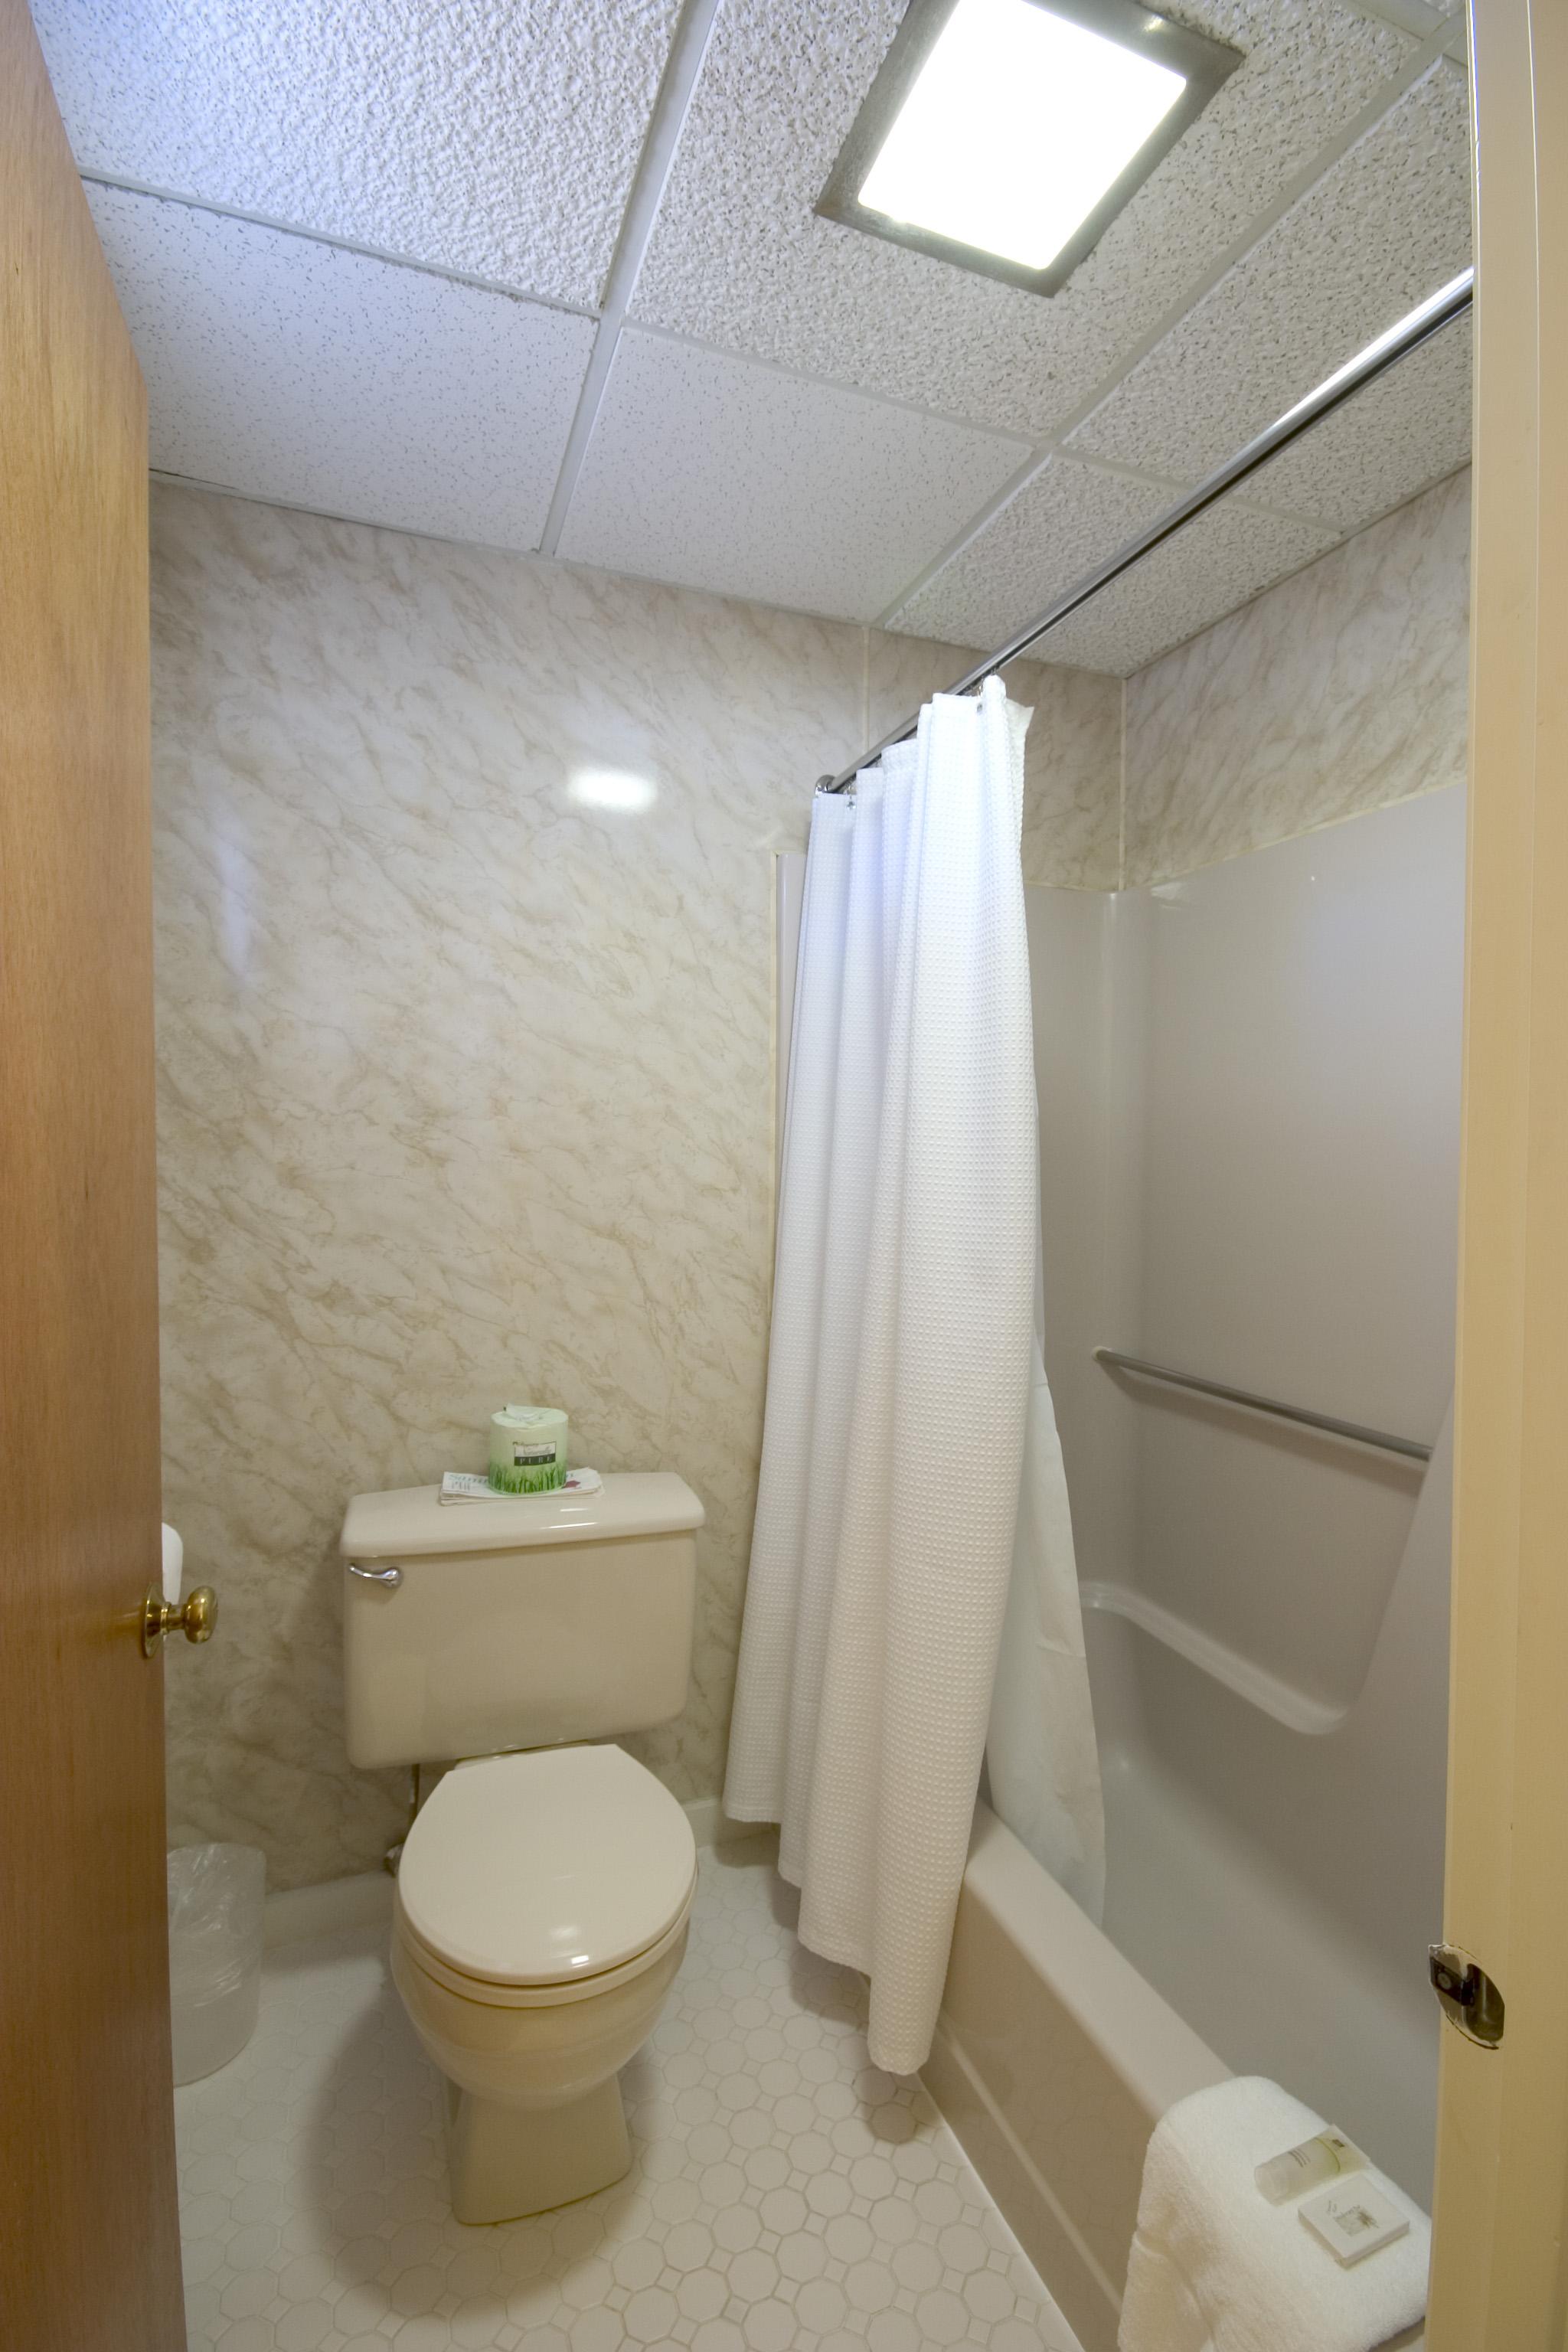 Town Motel - Bathroom